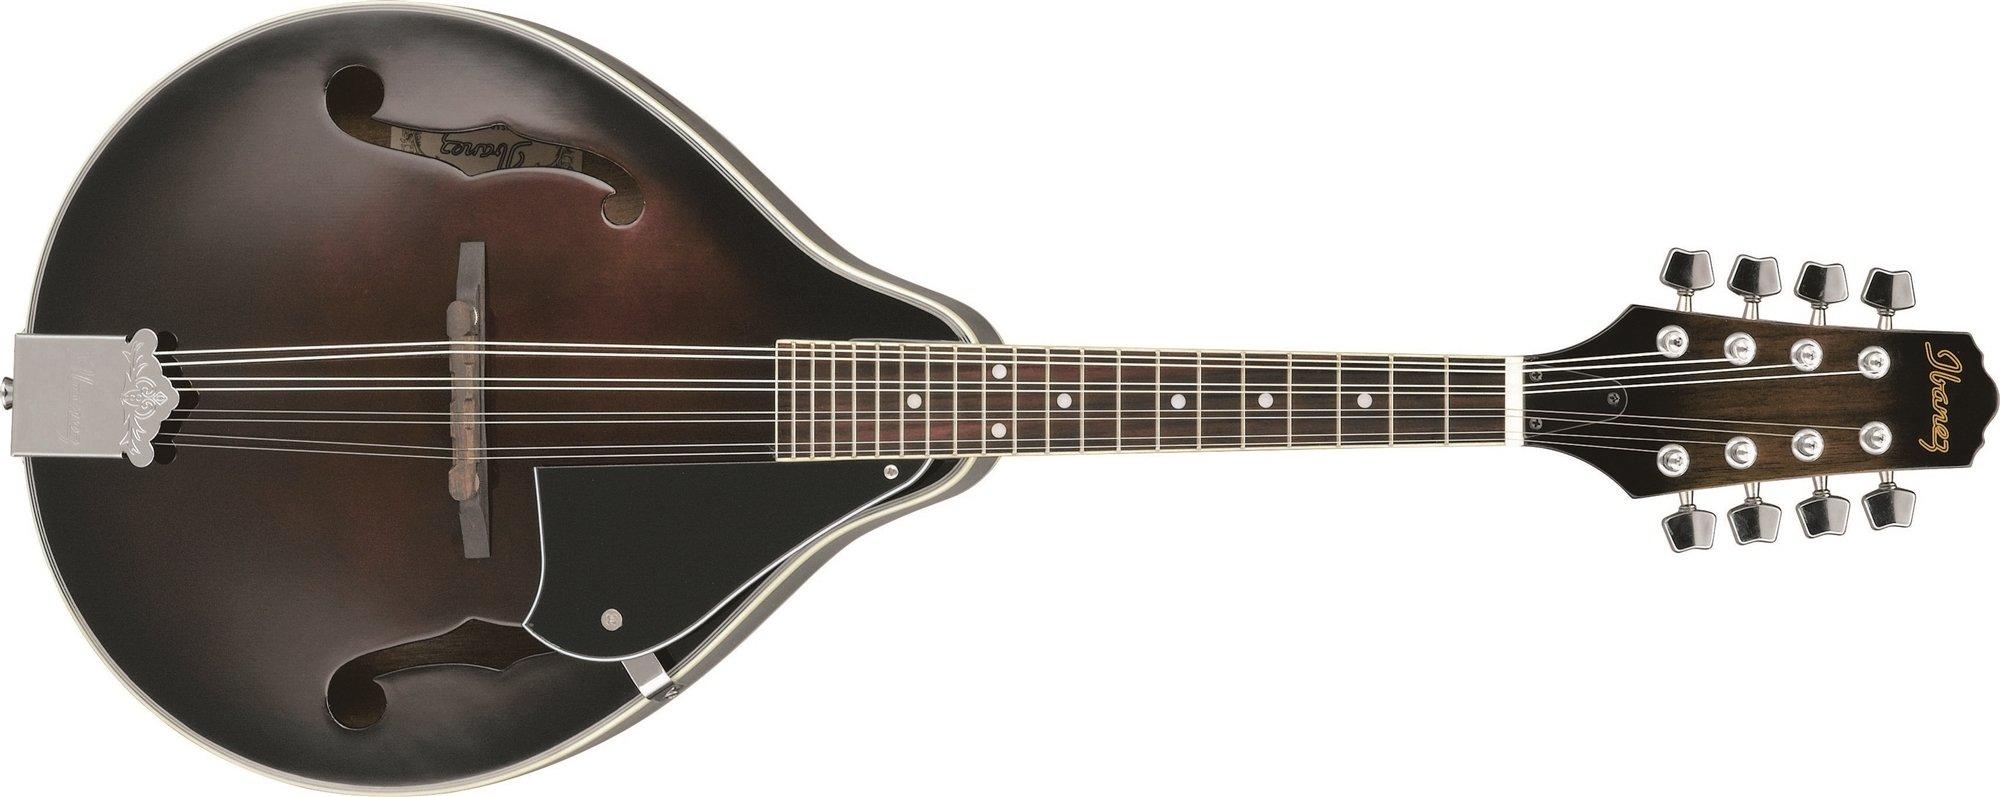 Ibanez M510-DVS A Style Mandolin, Dark Violin Sunburst